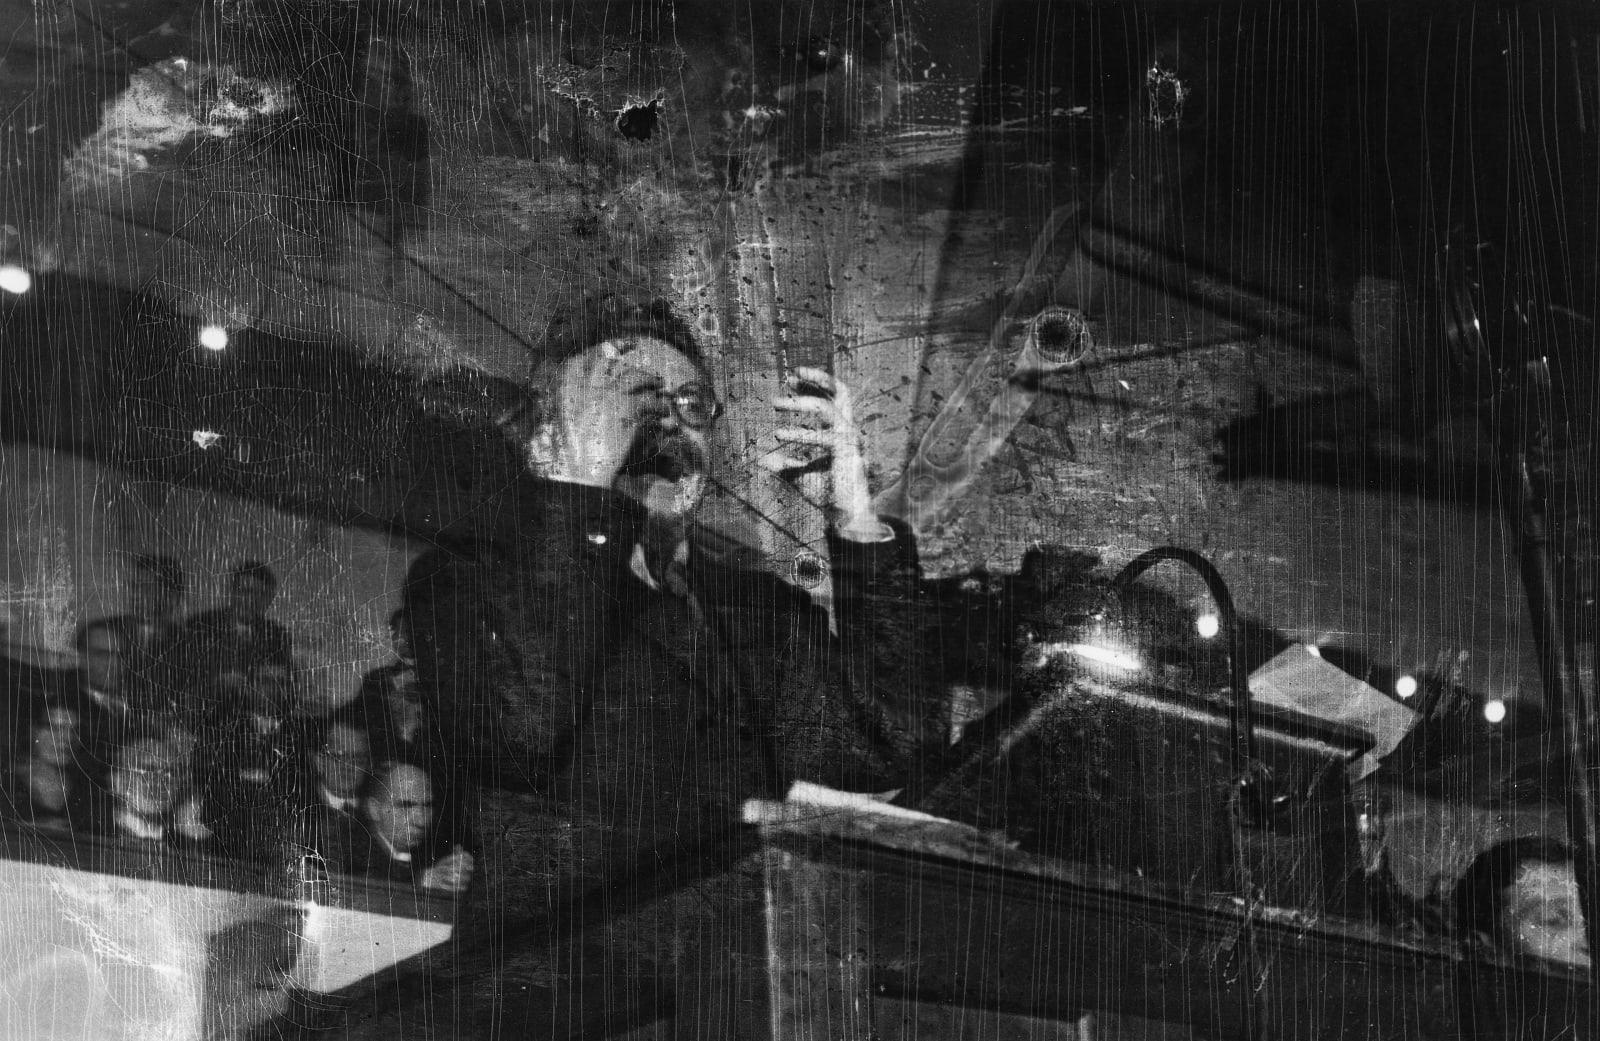 Robert Capa - Trotsky, Copenhagen, November 27th, 1932